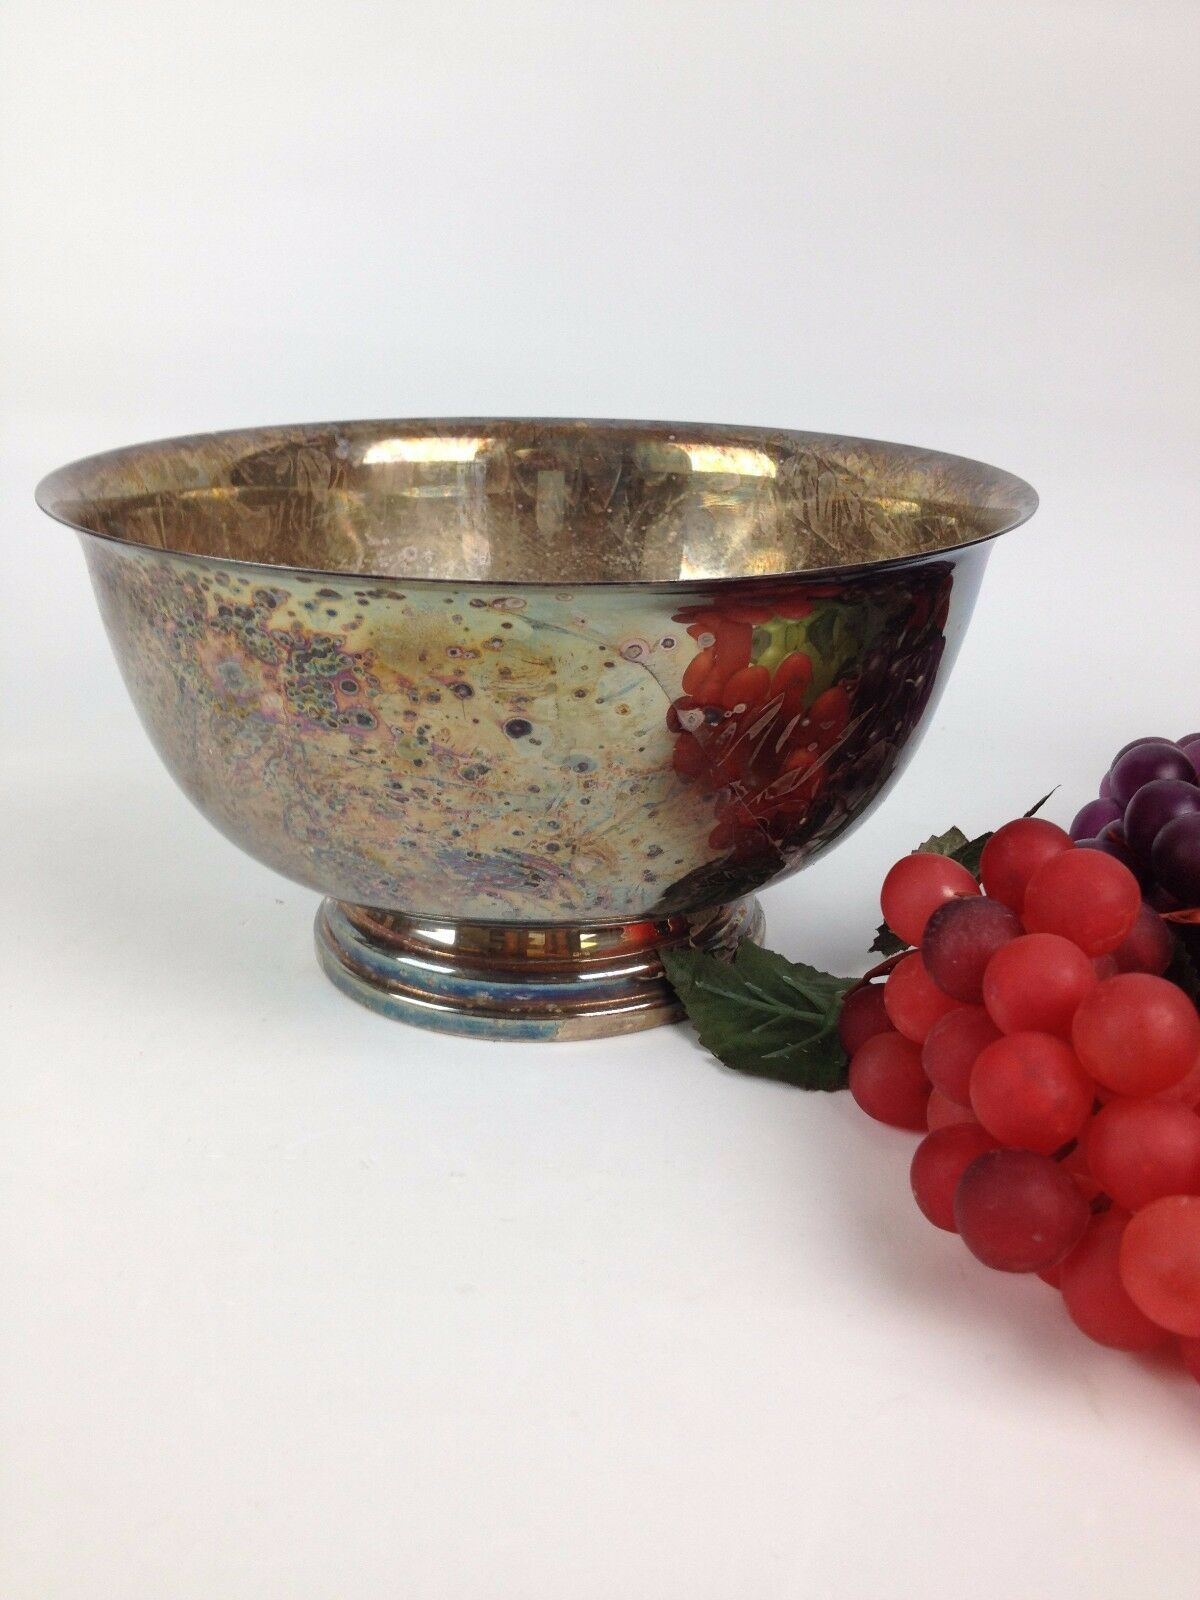 7 Bunches VTG Artificial Realistic Rubber Grapes Watson WP104 Silver Bowl Retro